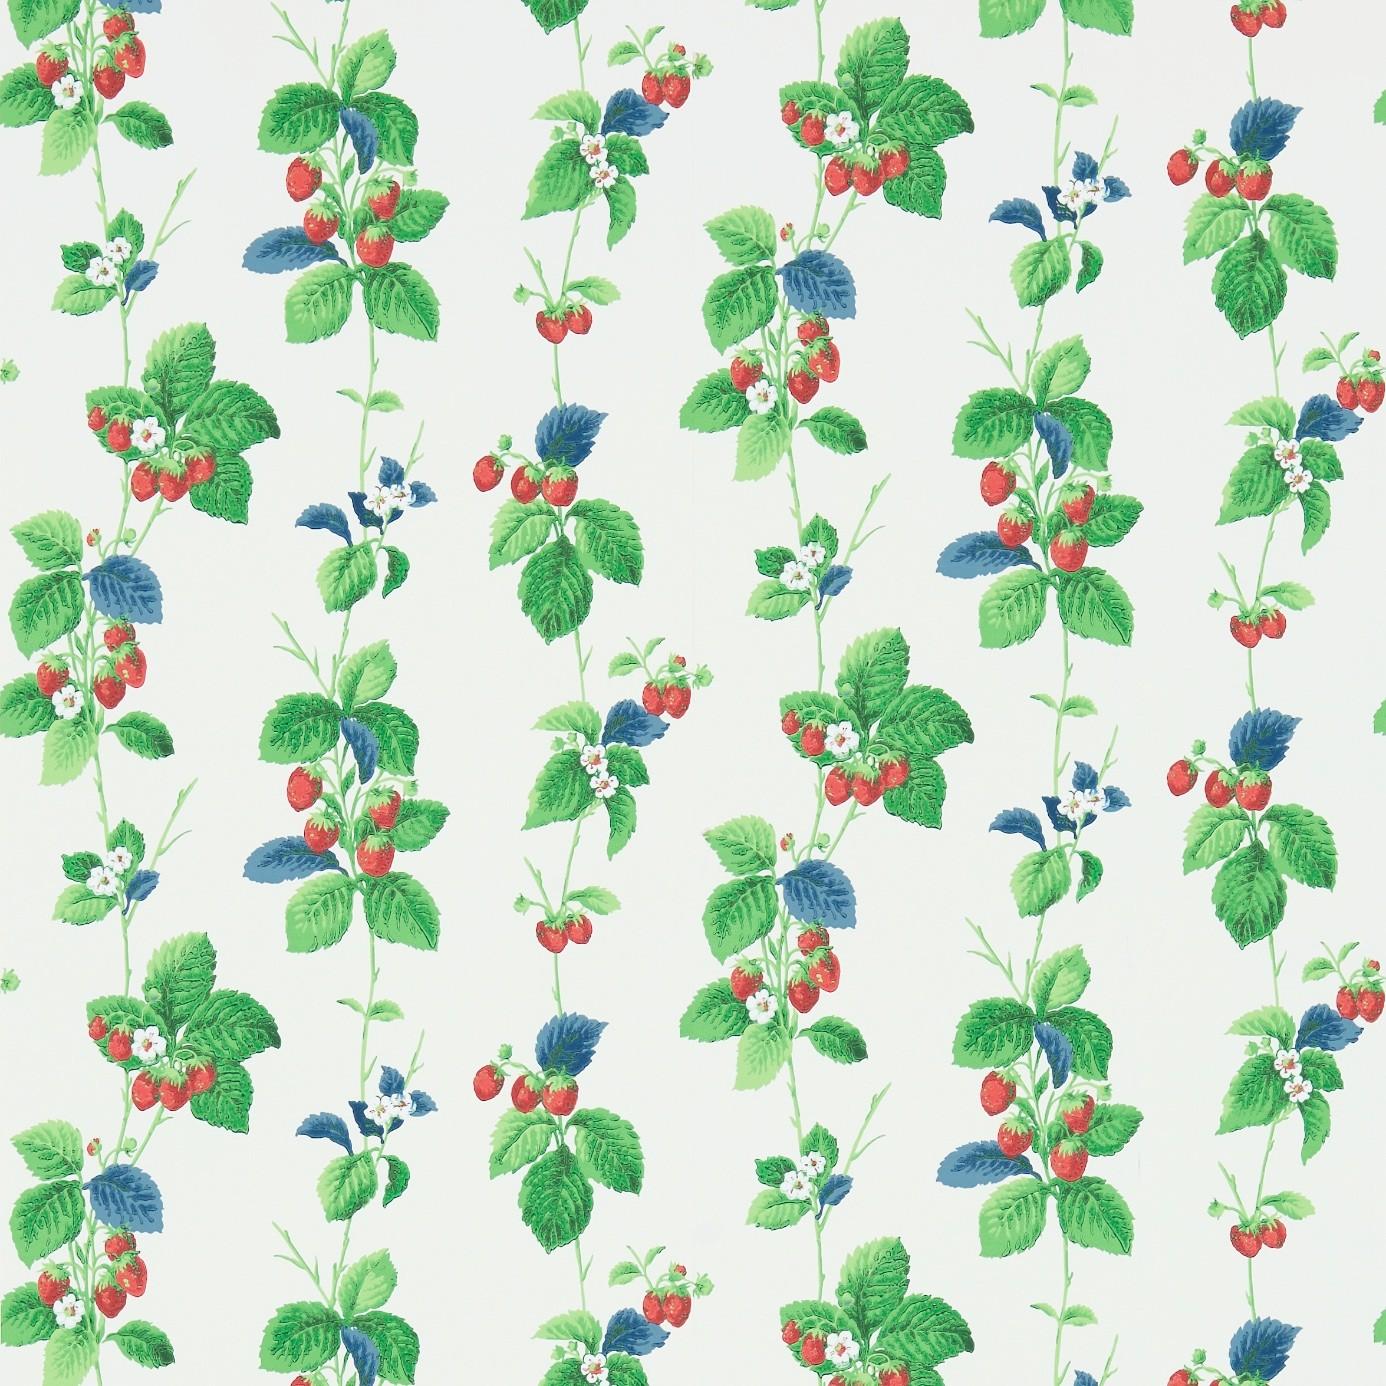 Sanderson Summer Strawberries 214592 Wallpaper Strawberry Leaf